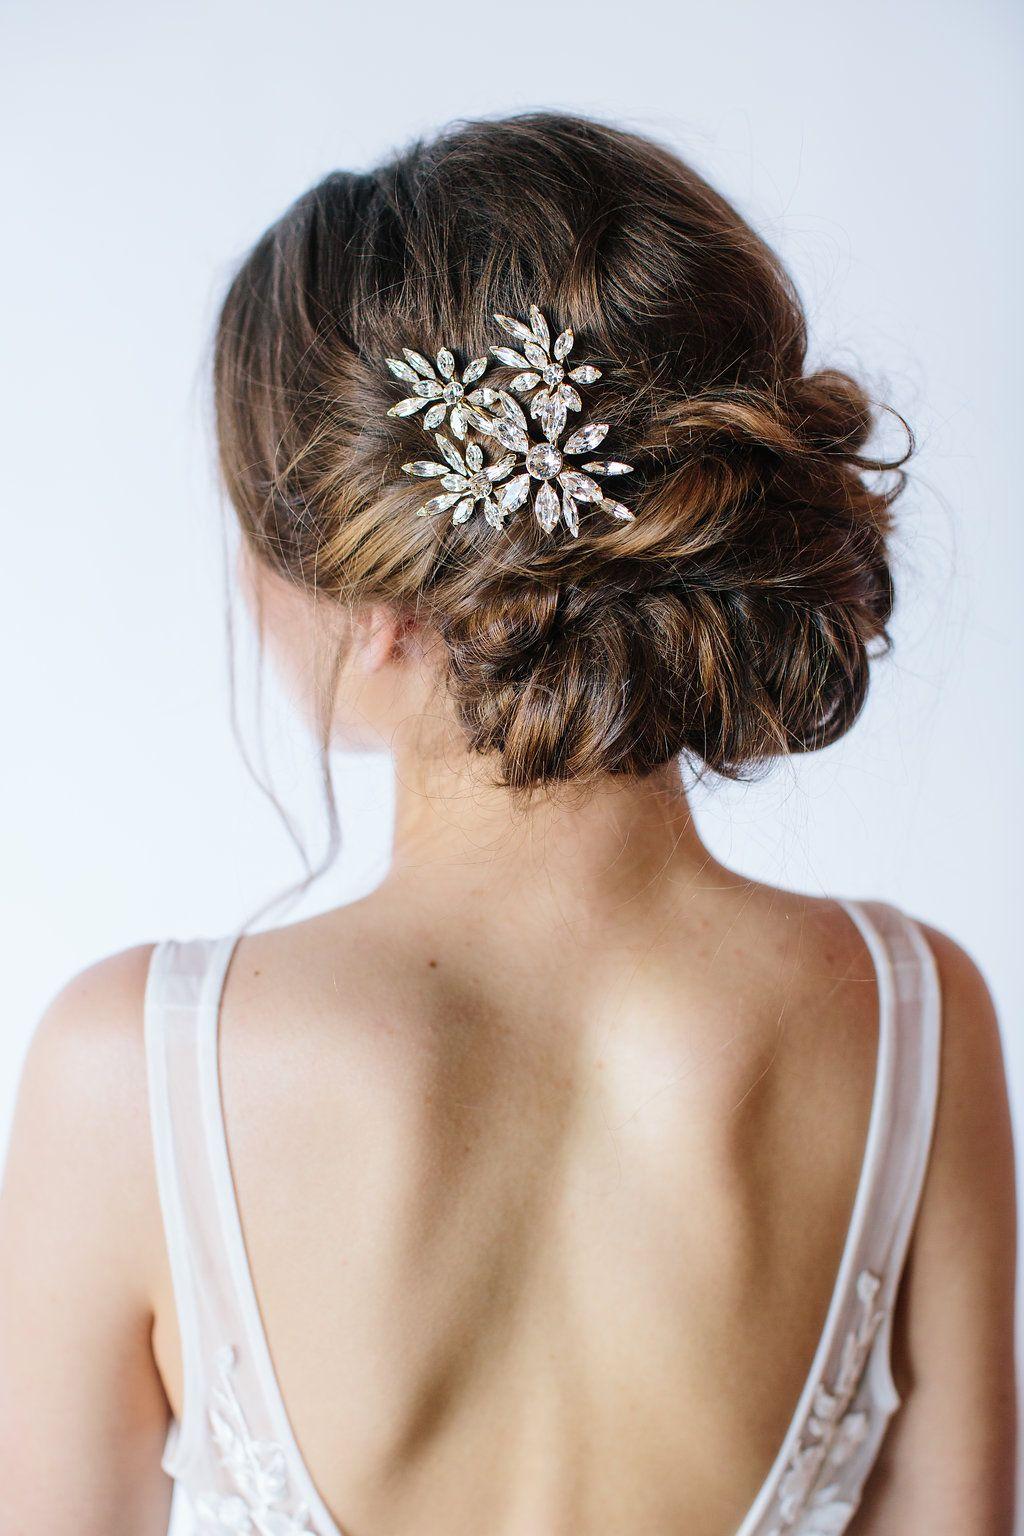 Crystal Bridal Hair Clip Wedding Ideas Pinterest Bri Samsung Smartwatch Gear S3 Frontier Sm R760ndaaxar Black